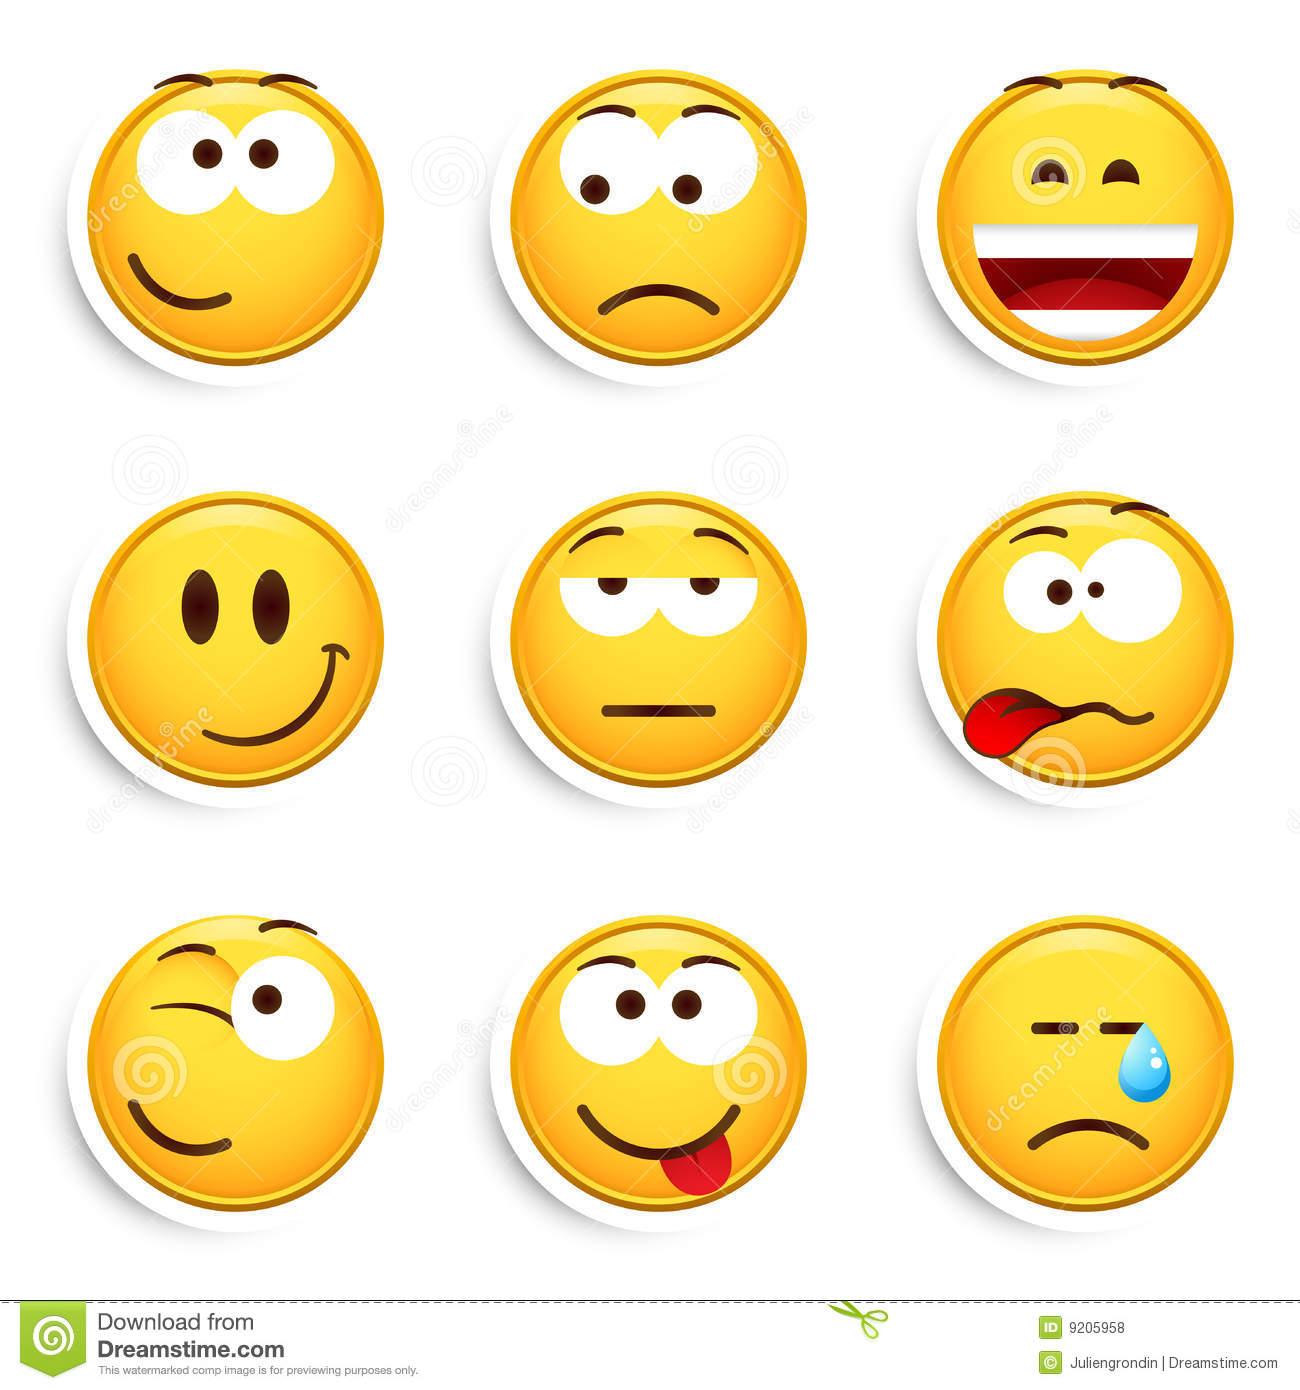 Smiley clip art free download .-Smiley clip art free download .-1